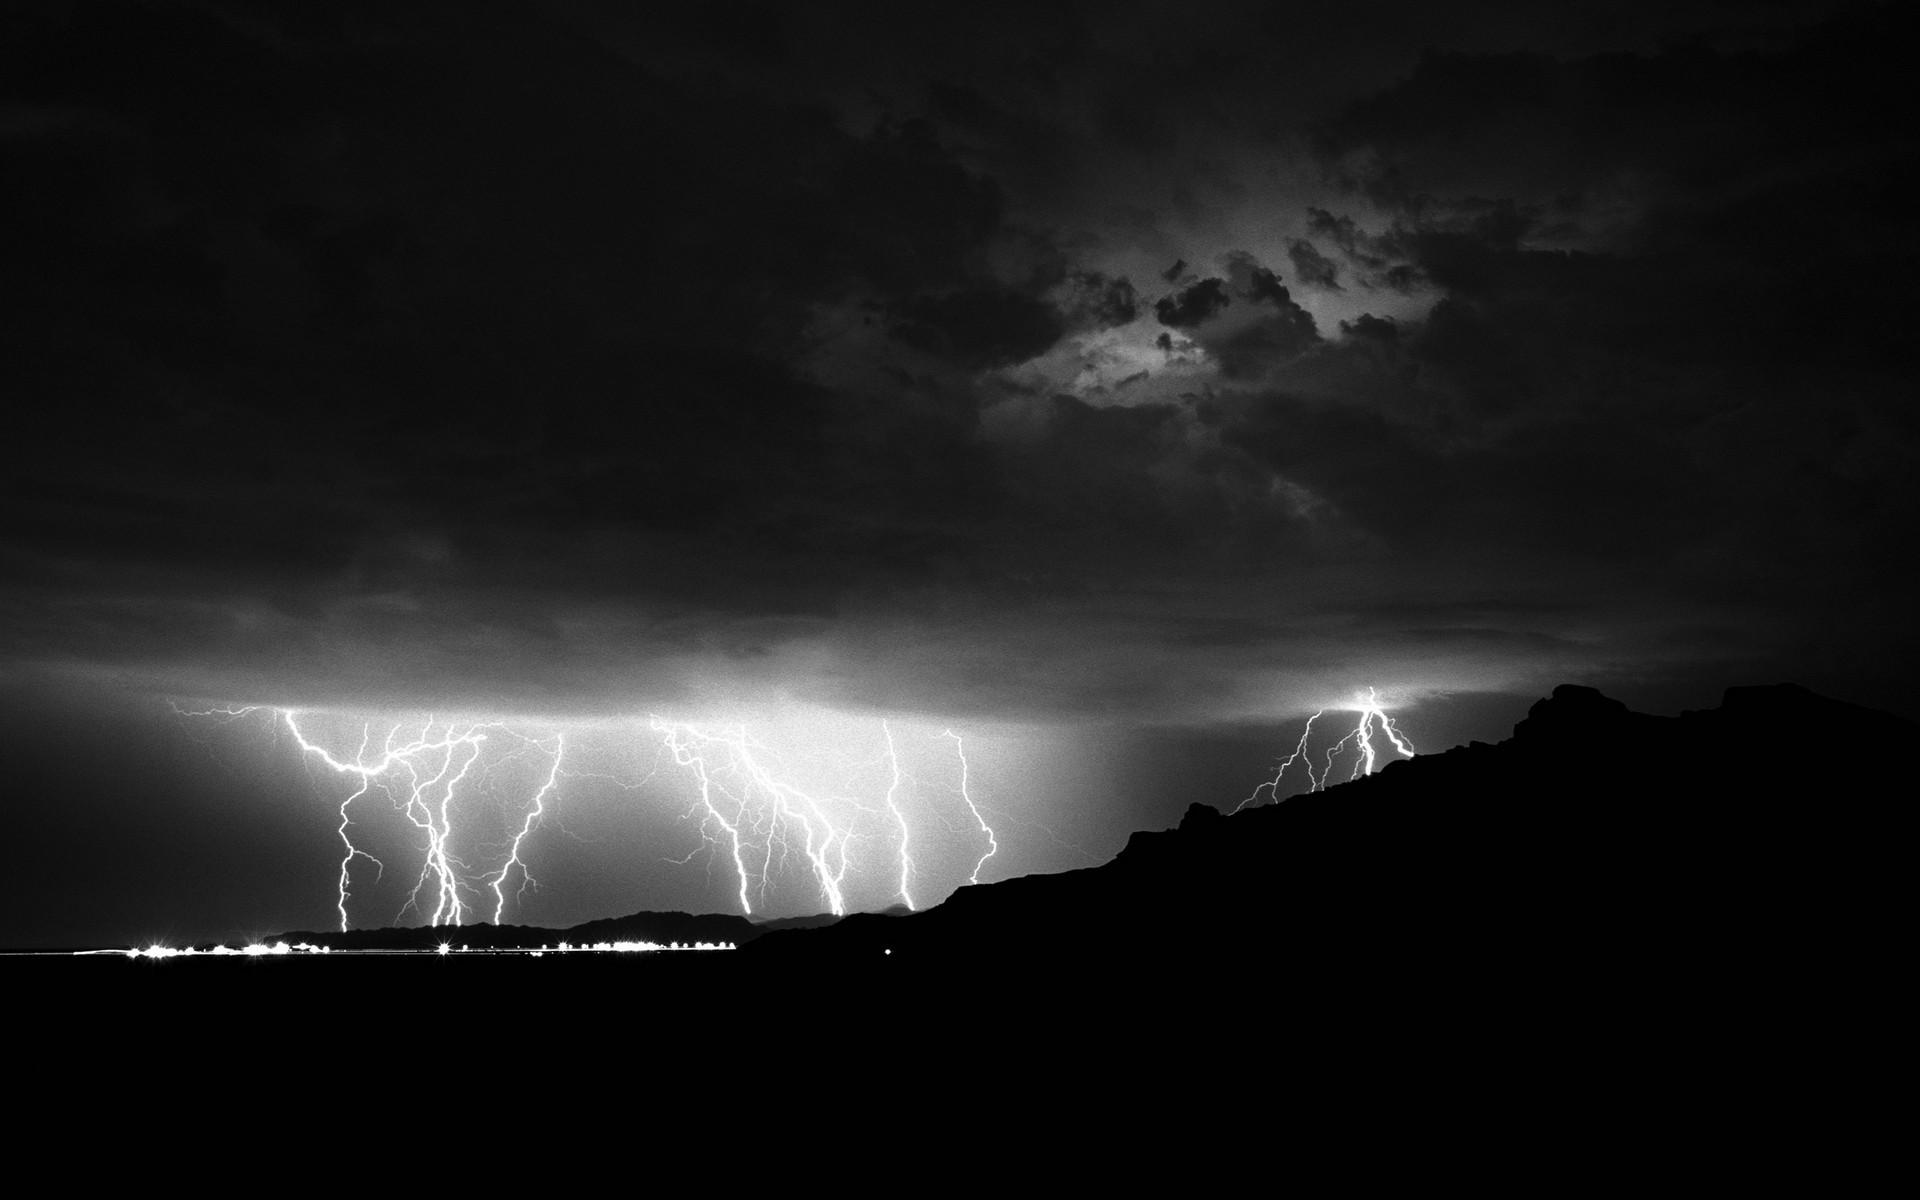 Simple Wooden Bridge Lightning Storm Sunset Lake Wood Best 17796 wallpaper  | Desktop Wallpapers | Pinterest | Sunset lake, Lightning and Storms